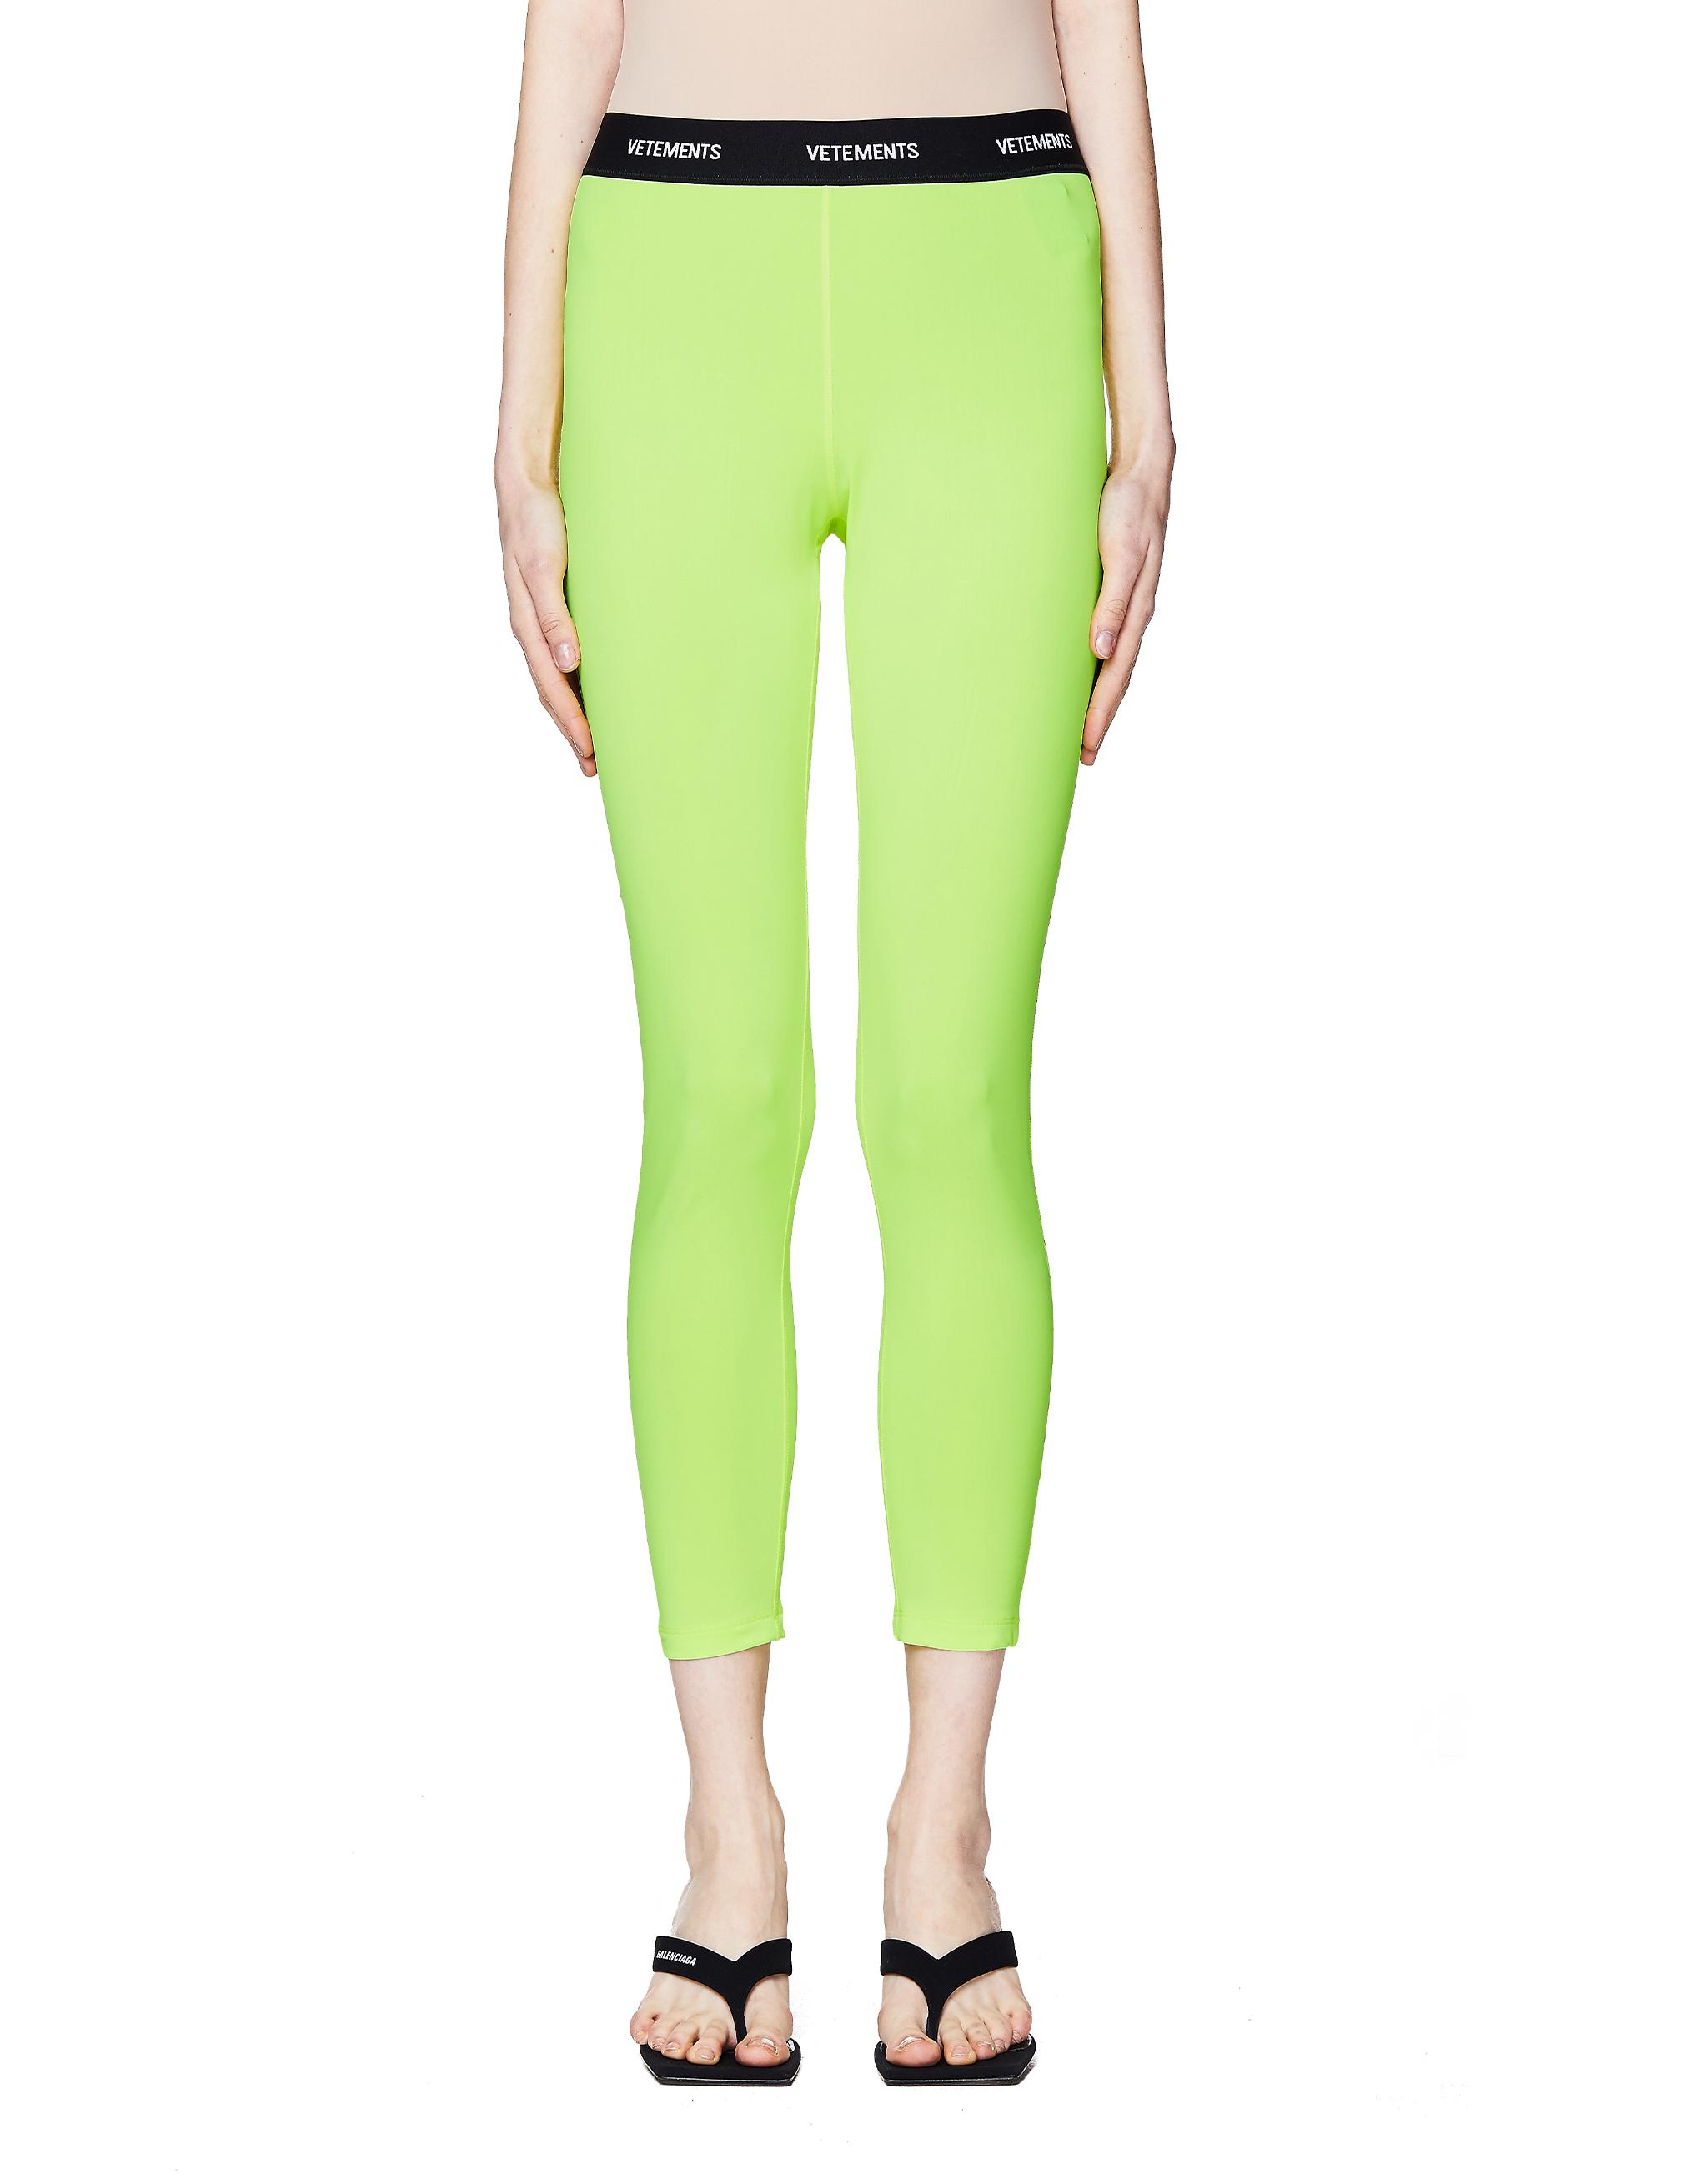 Vetements Neon Yellow Leggings